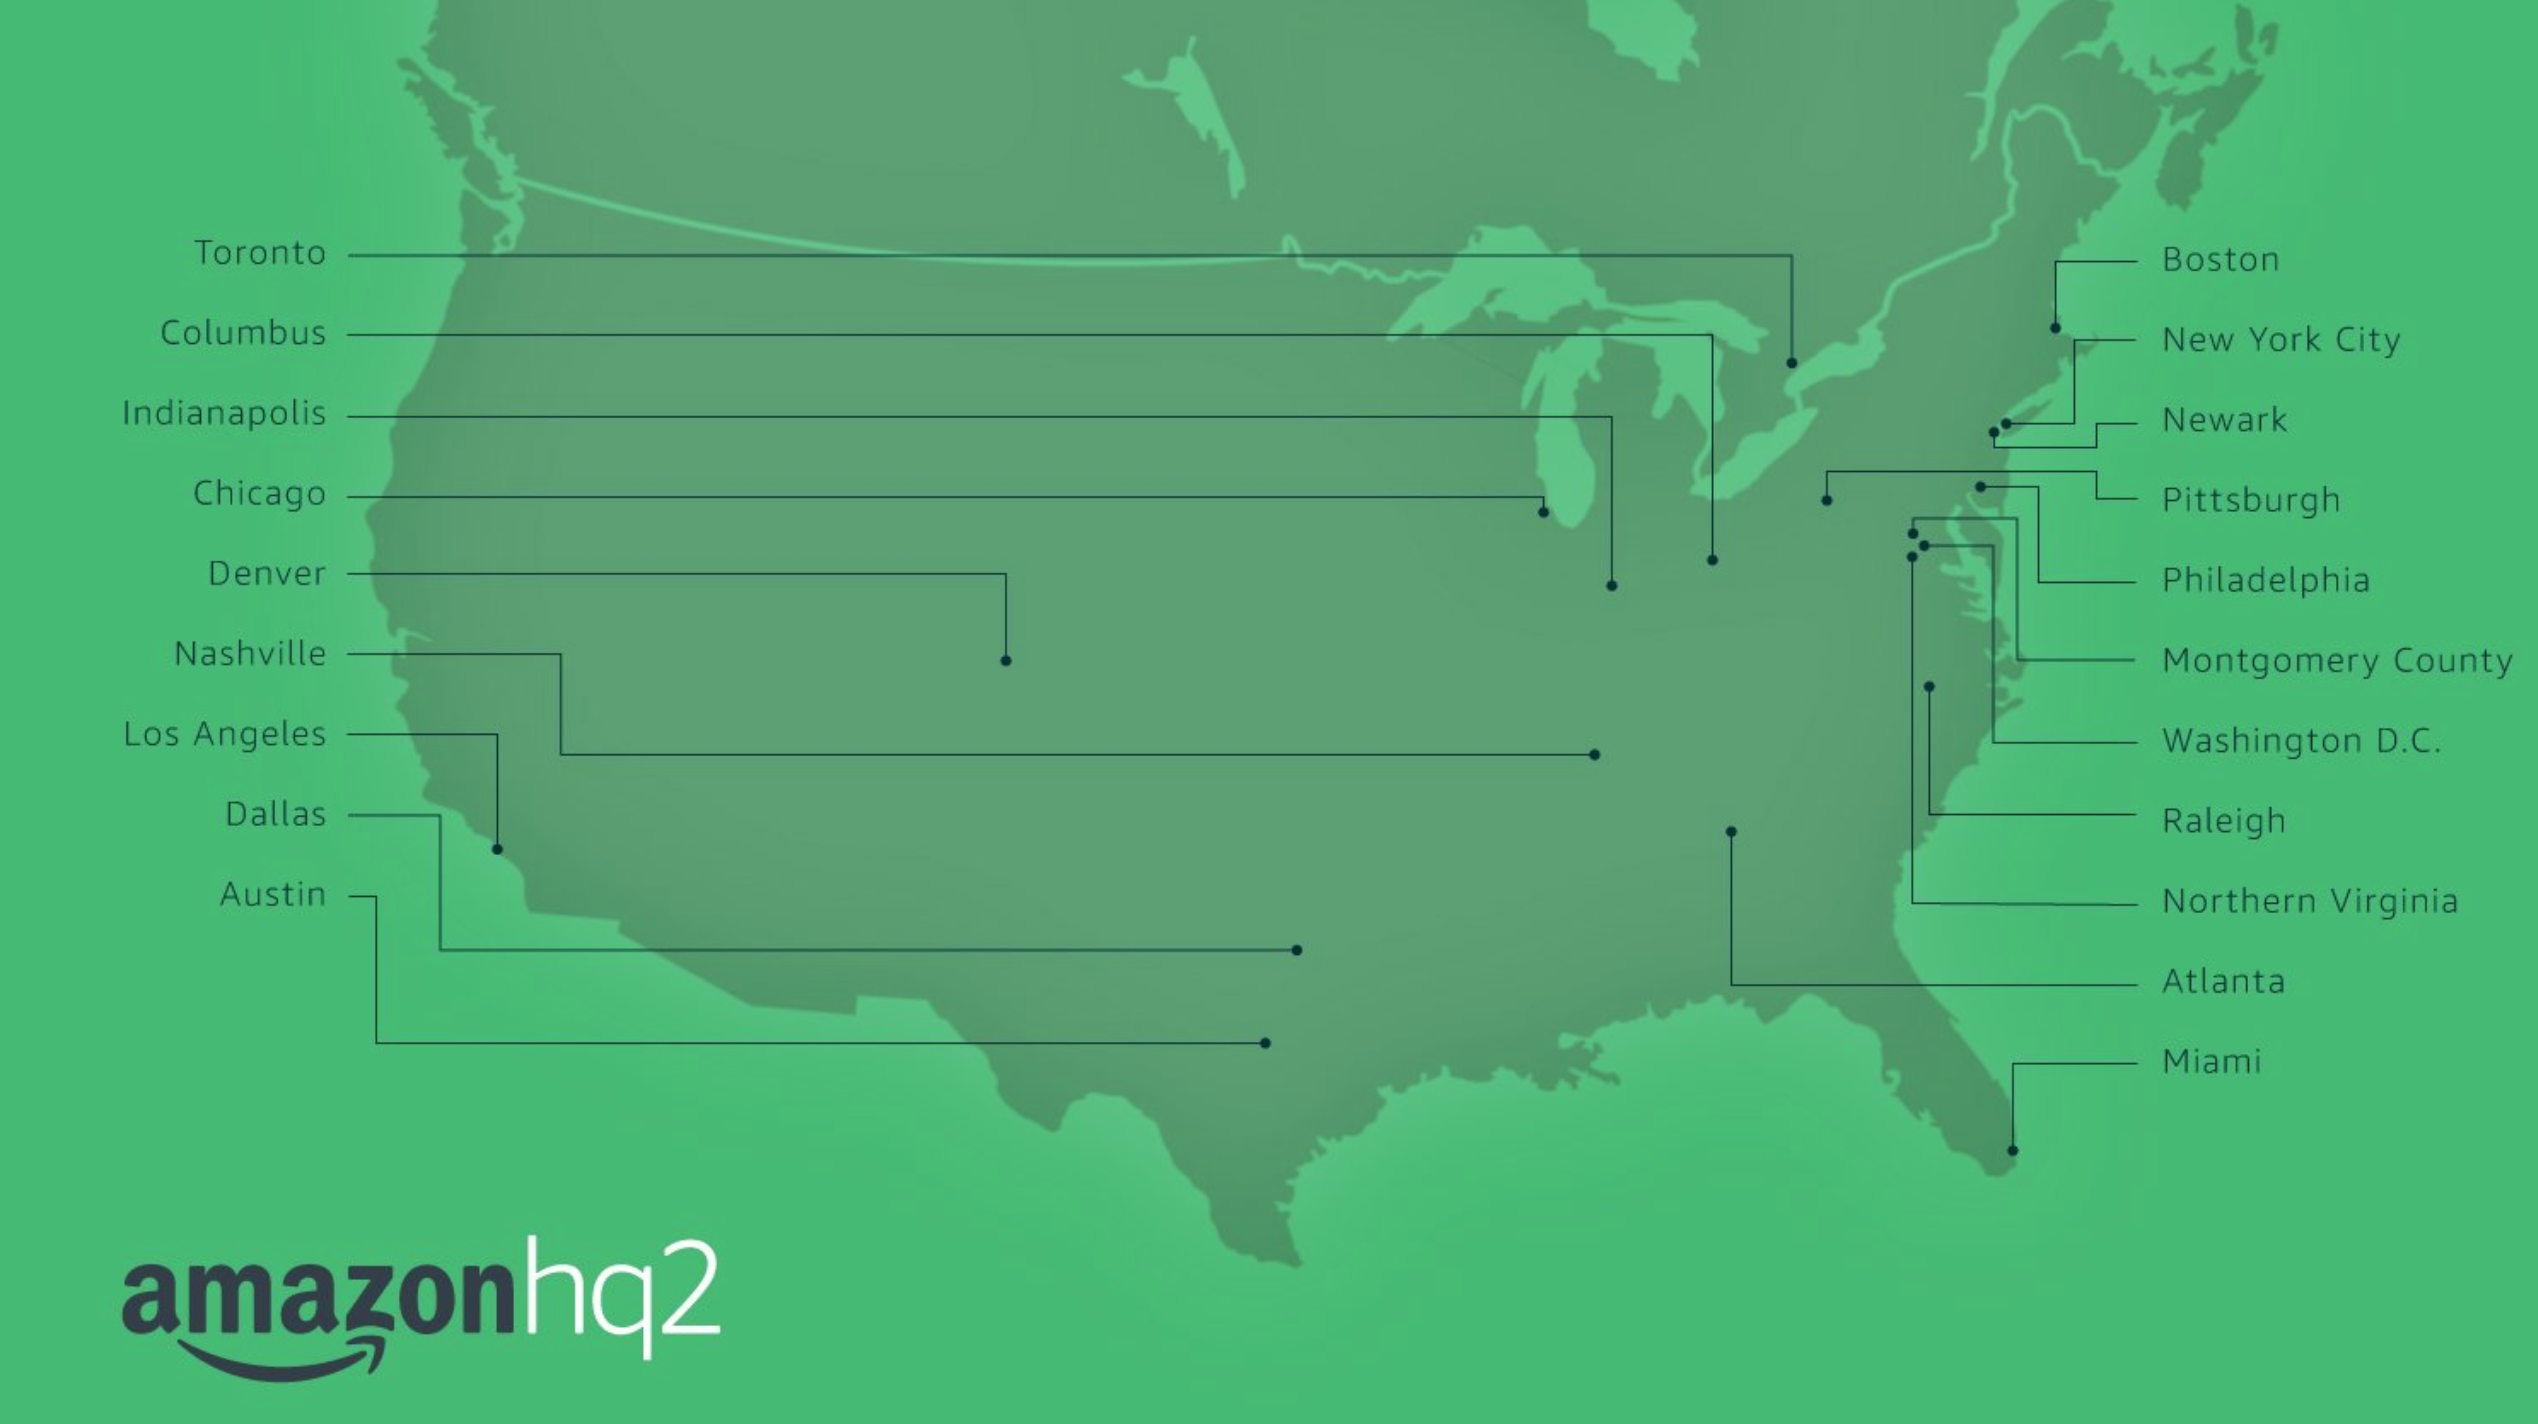 Amazonの50億ドル 全米第2ヘッドクオーター争奪合戦 20